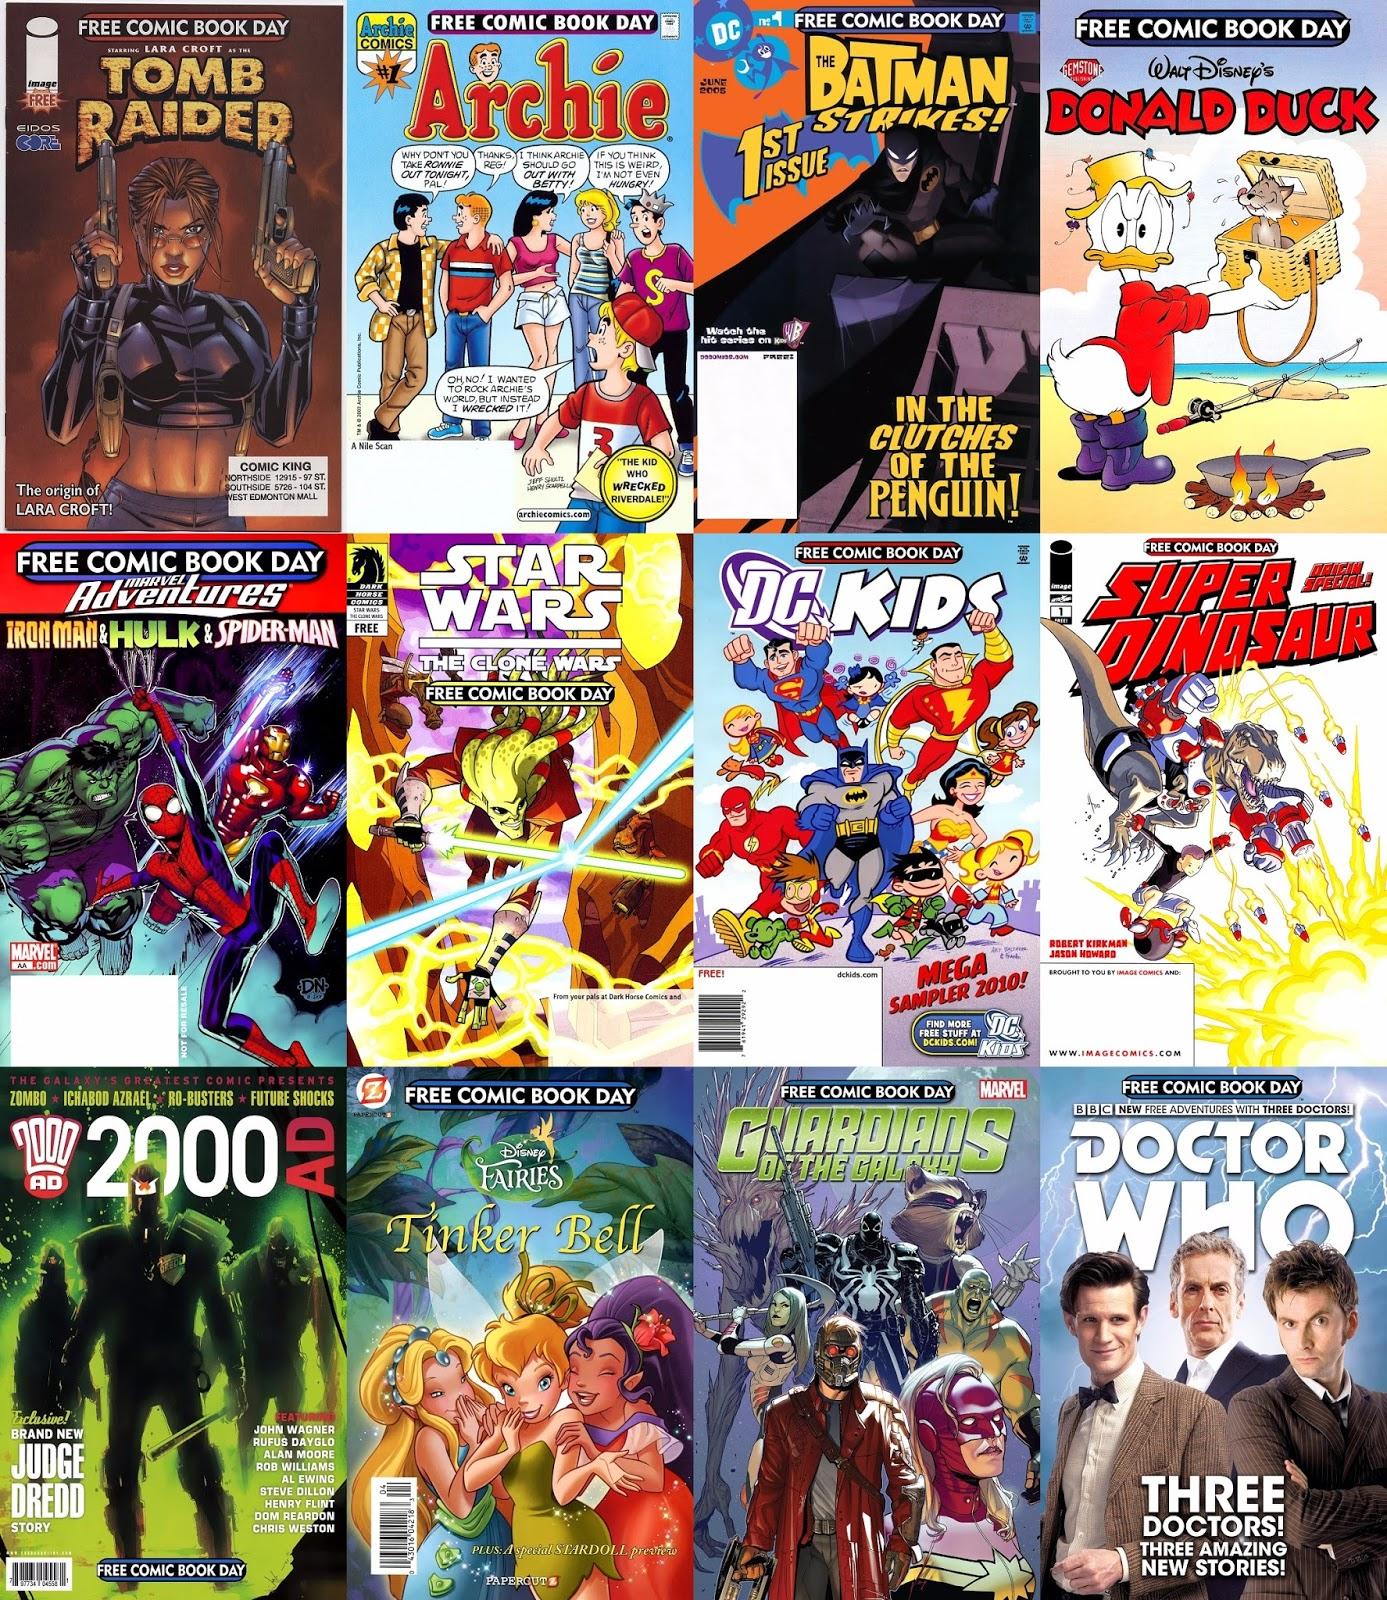 Free Comic Book Day España: Free Comic Book Day (FCBD) (2002-2015) (scans+digital